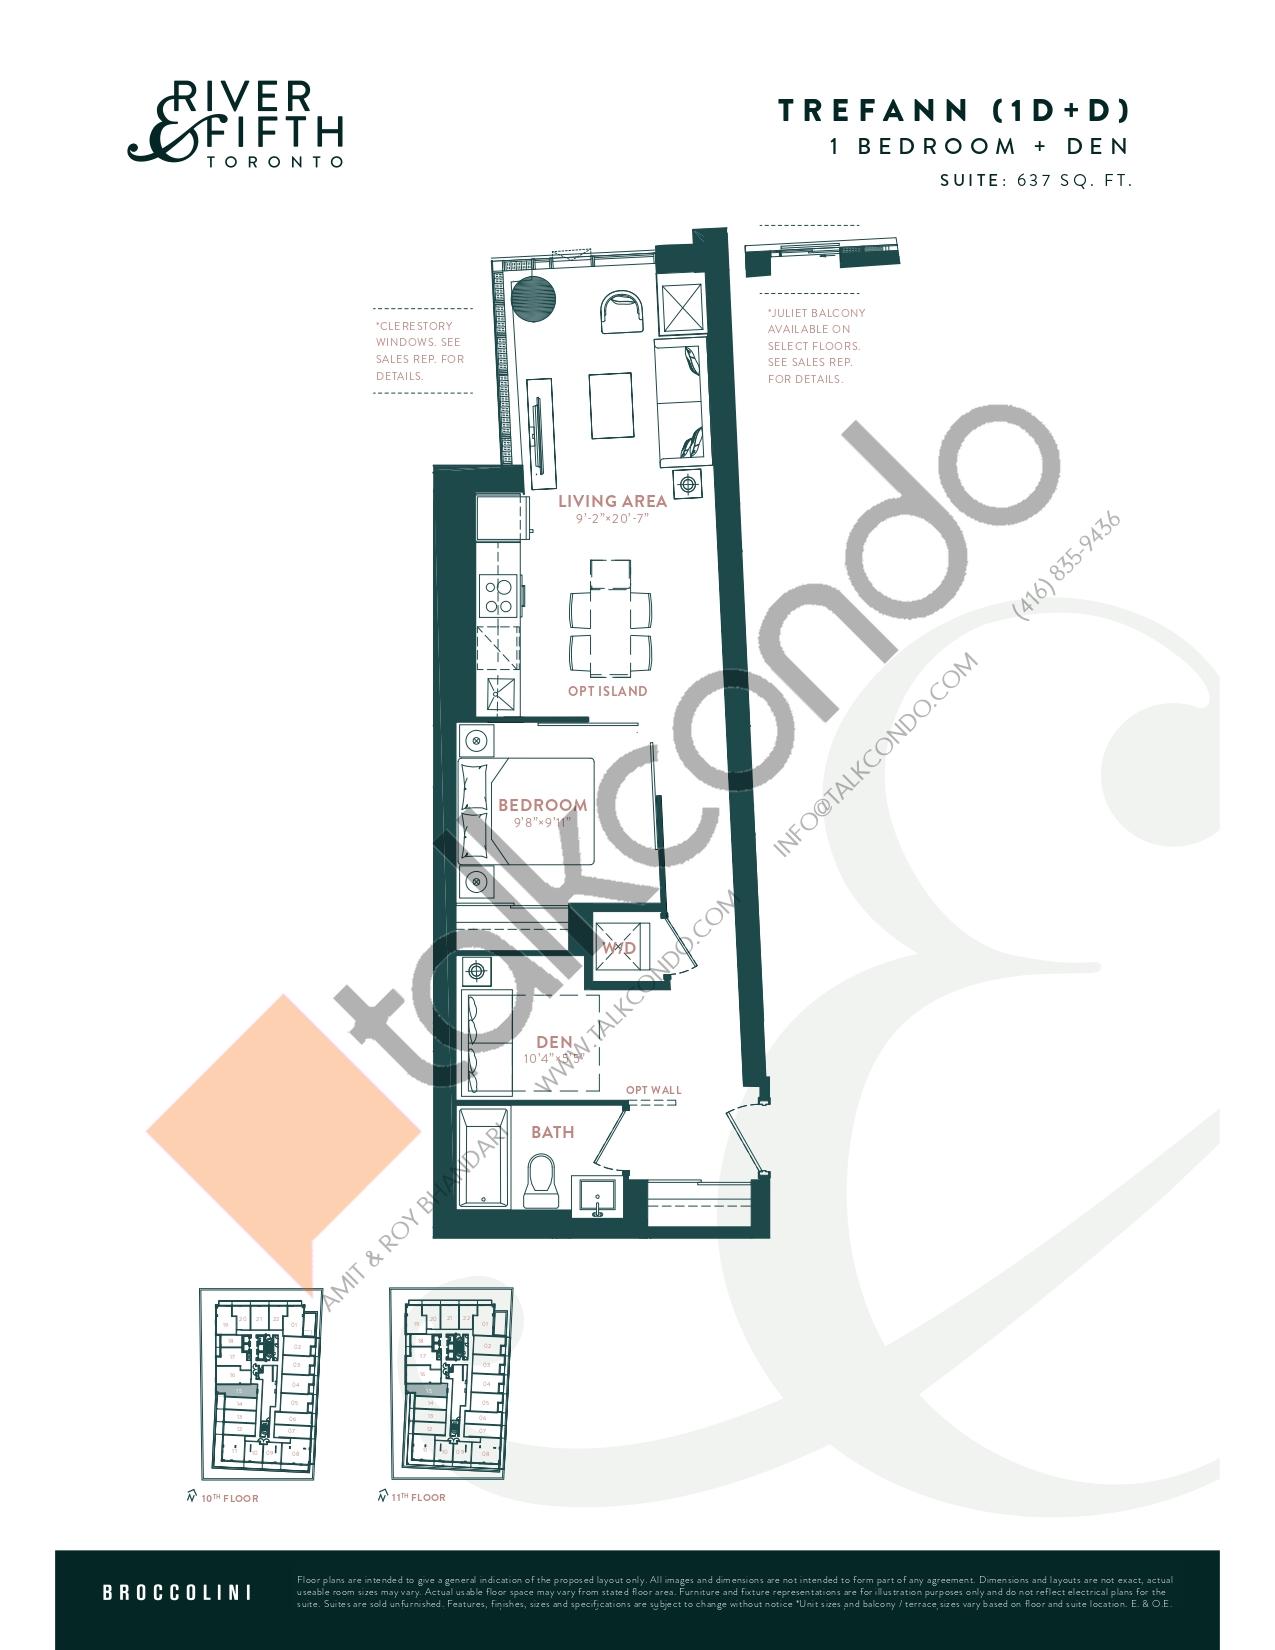 Trefann (1D+D) Floor Plan at River & Fifth Condos - 637 sq.ft